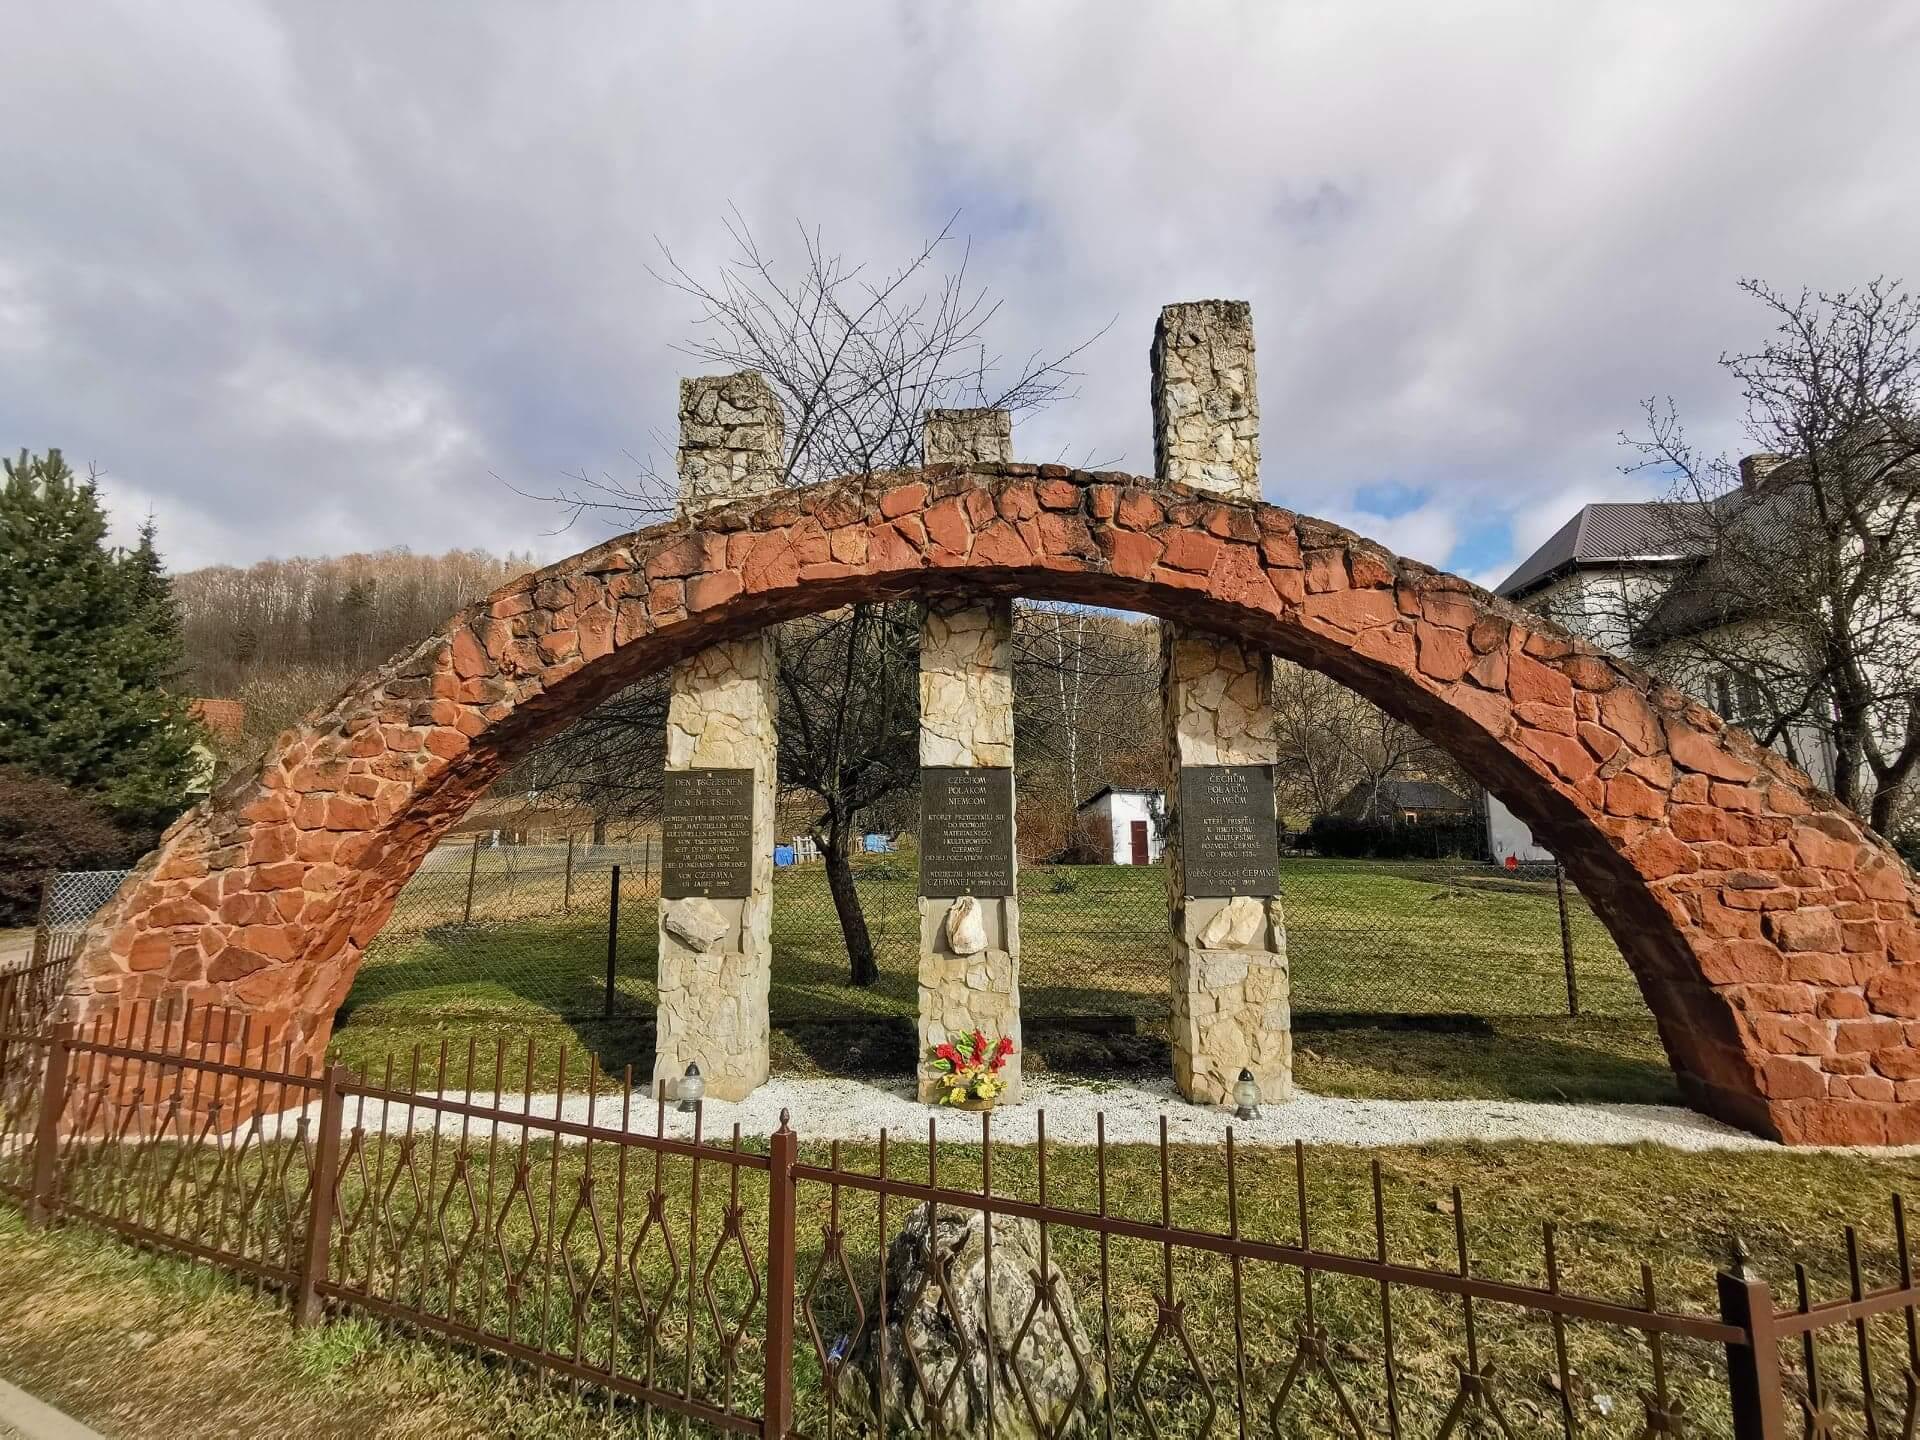 Pomnik Trzech Kultur w Kudowie-Zdroju